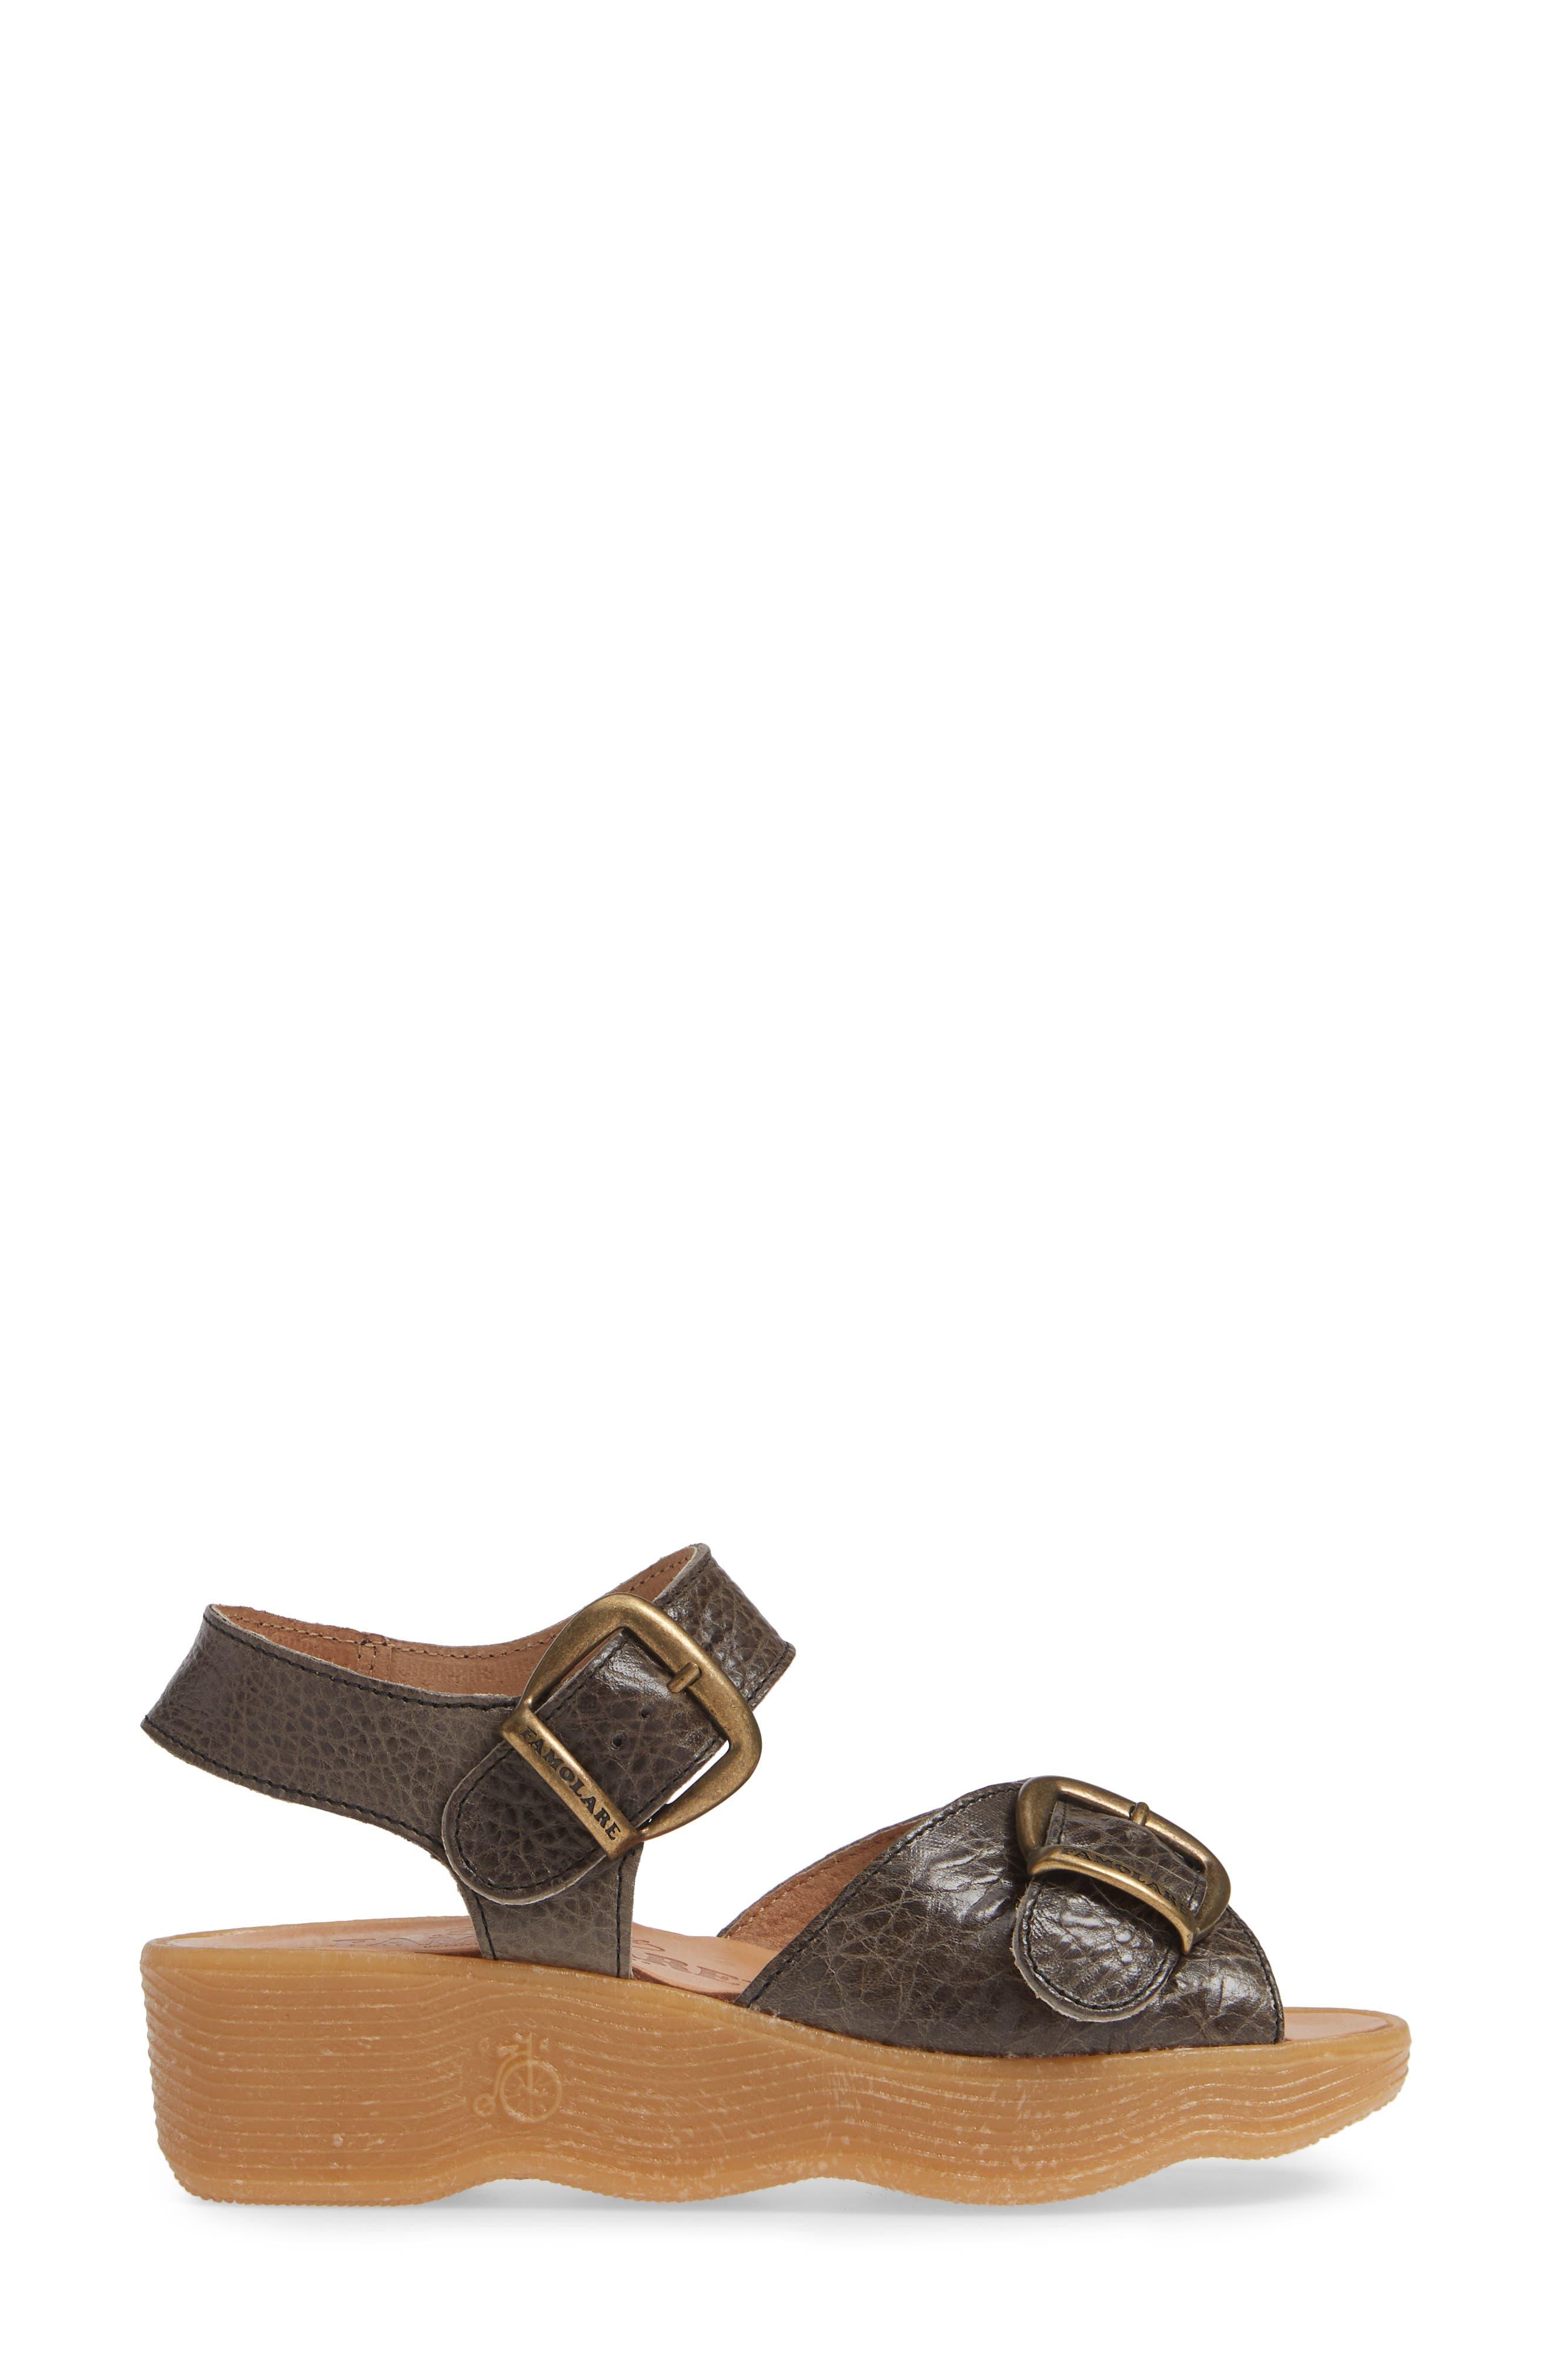 Double Play Platform Sandal,                             Alternate thumbnail 3, color,                             STEEL SUEDE